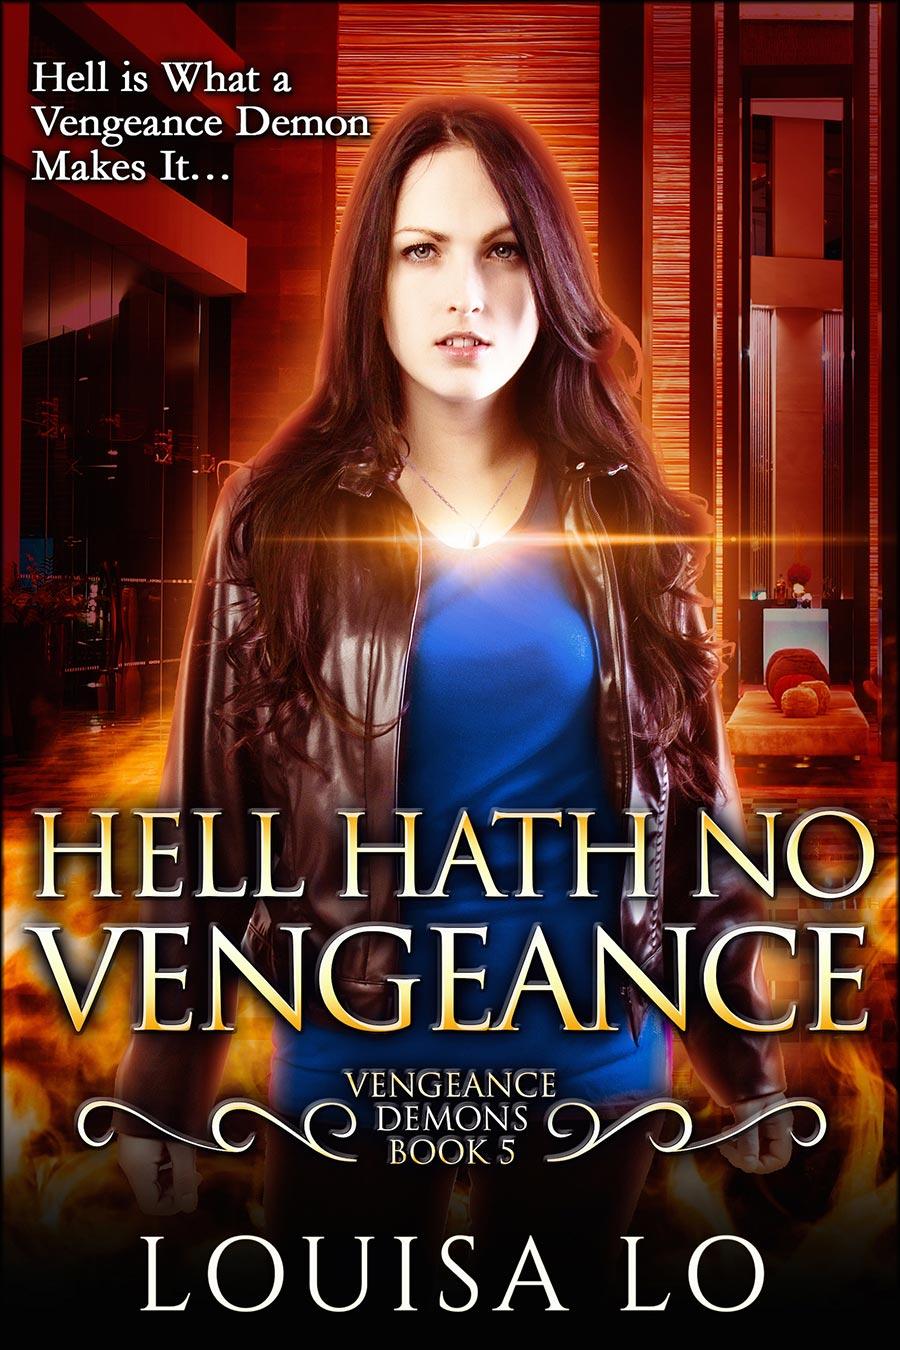 Louisa-Lo---Hell-Hath-No-Vengeance---book-5.jpg